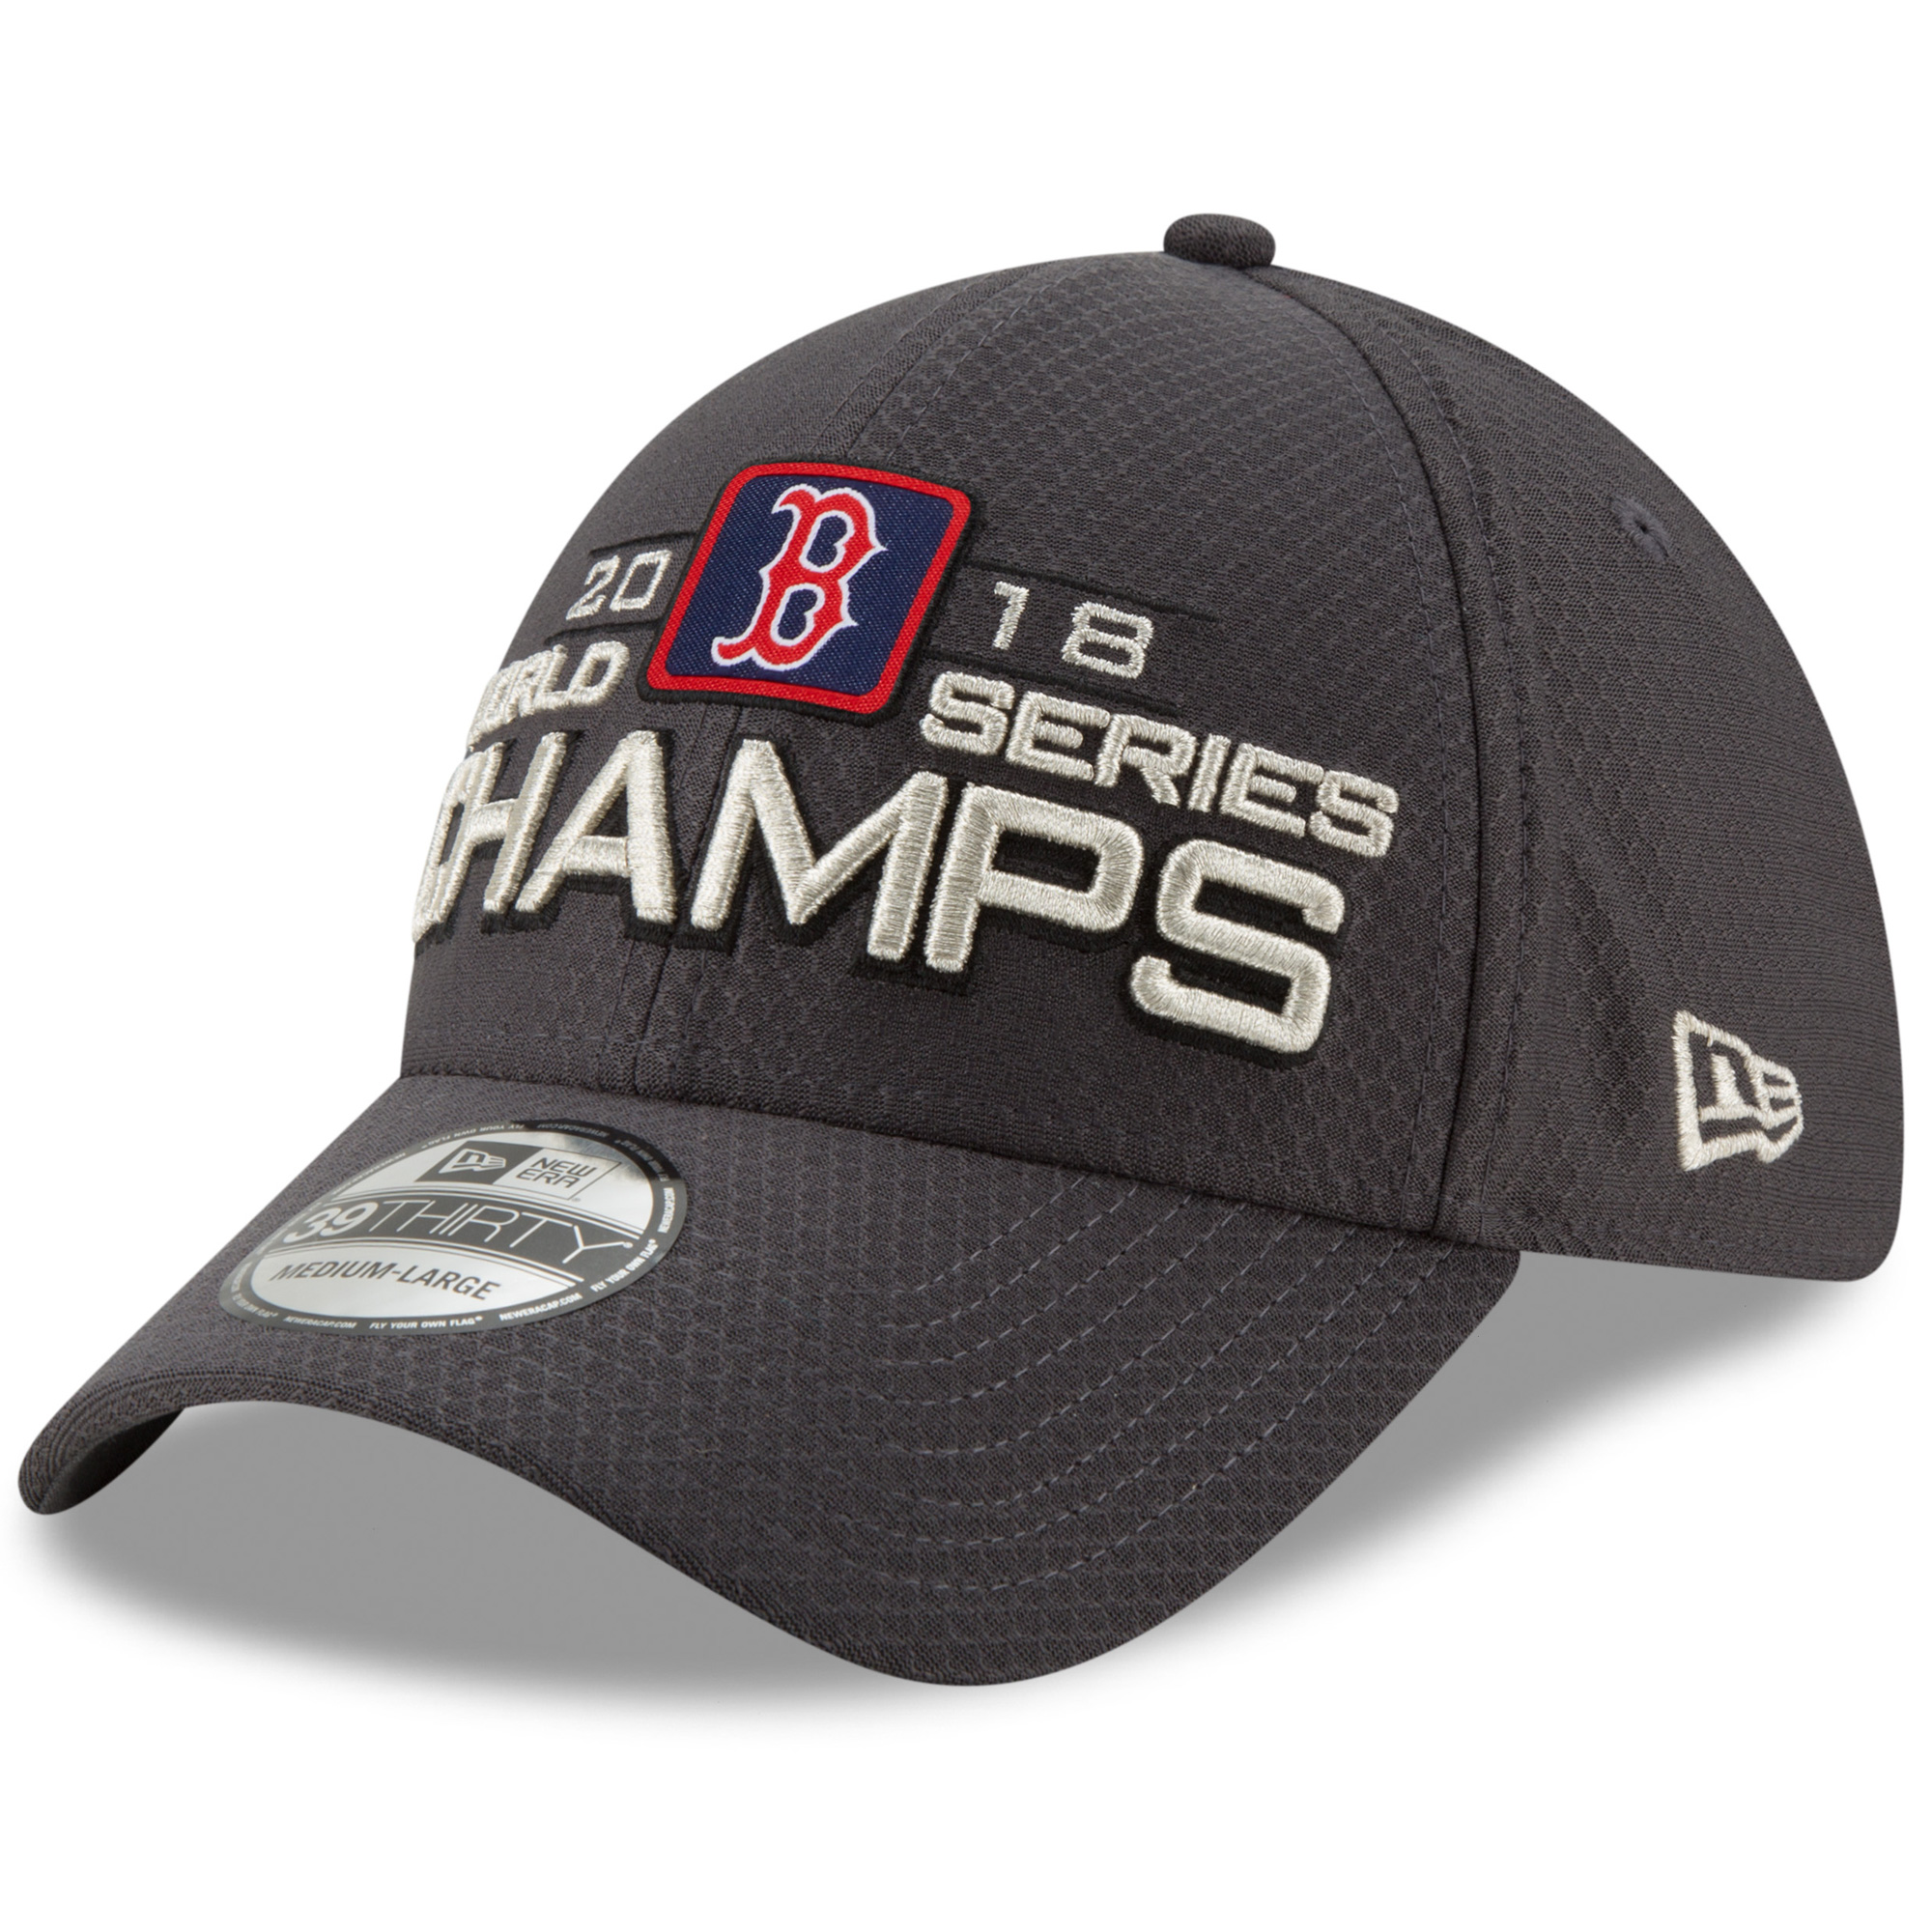 info for bb595 9b0df Boston Red Sox New Era 2018 World Series Champions Locker Room 39THIRTY  Flex Hat - Charcoal - OSFM - Walmart.com